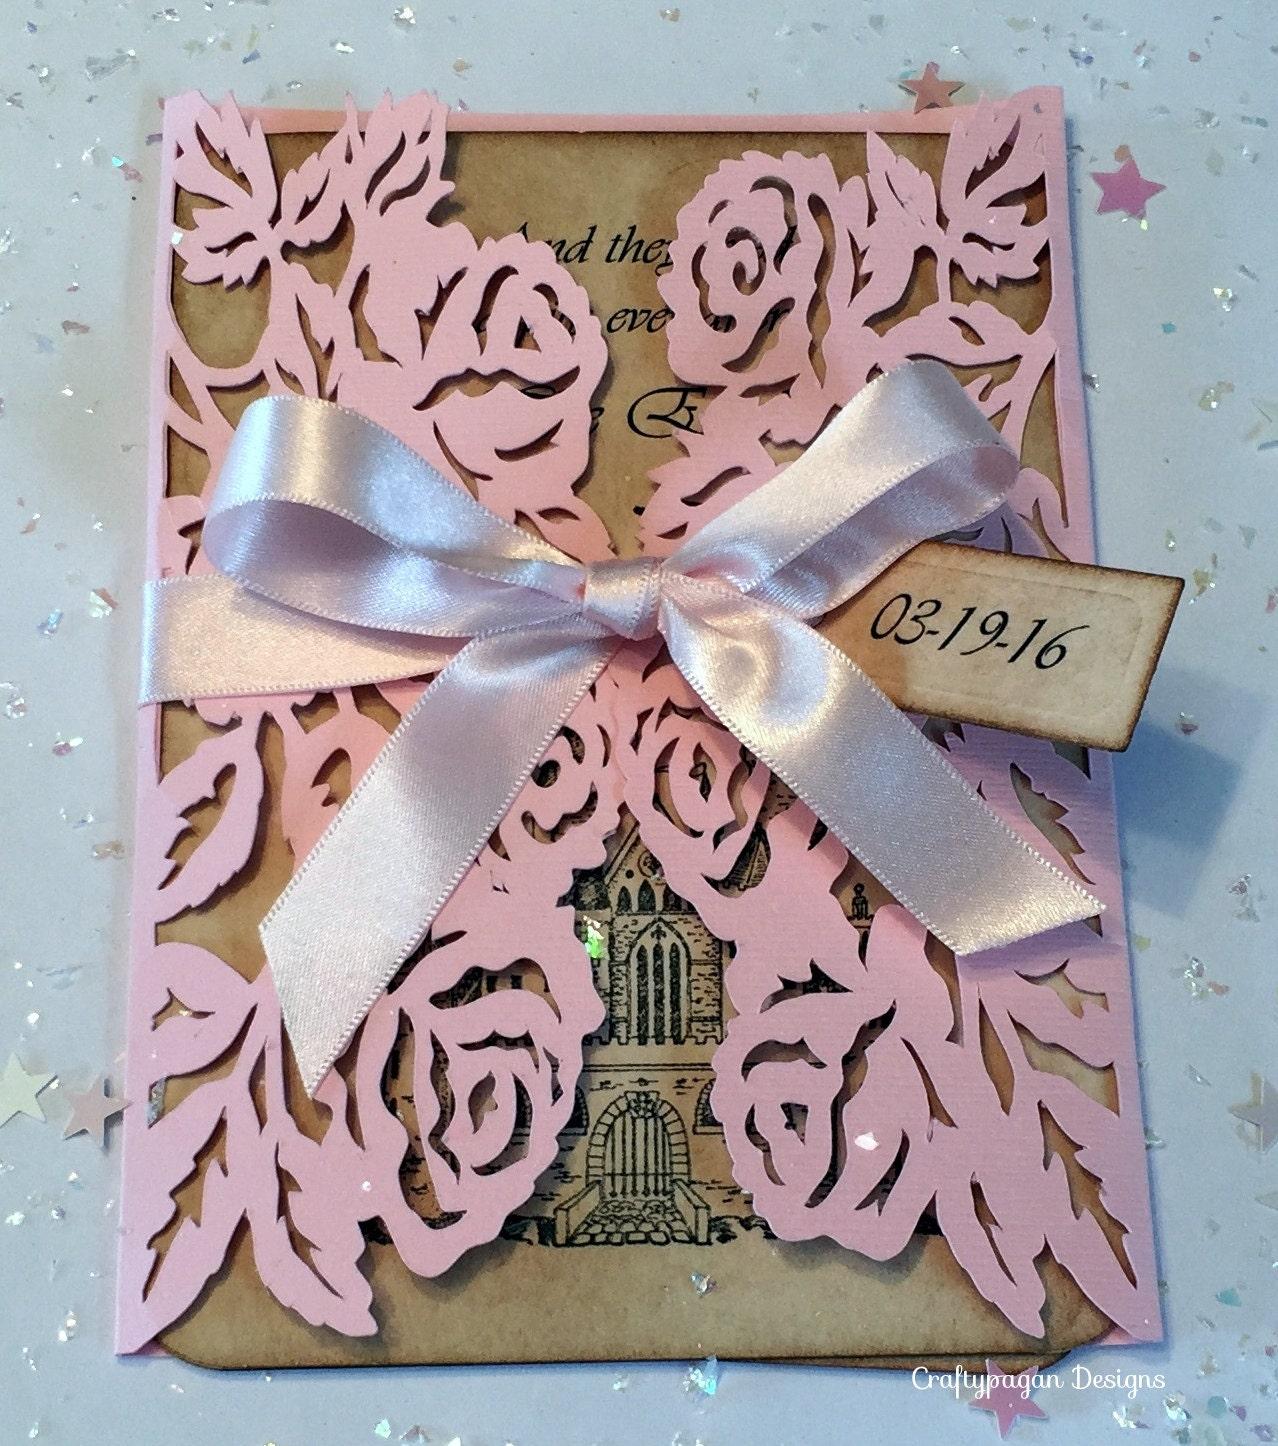 Fairytale Invitations Wedding: 30 Fairytale Wedding Invitation Suite With Rose Wrap RSVPs